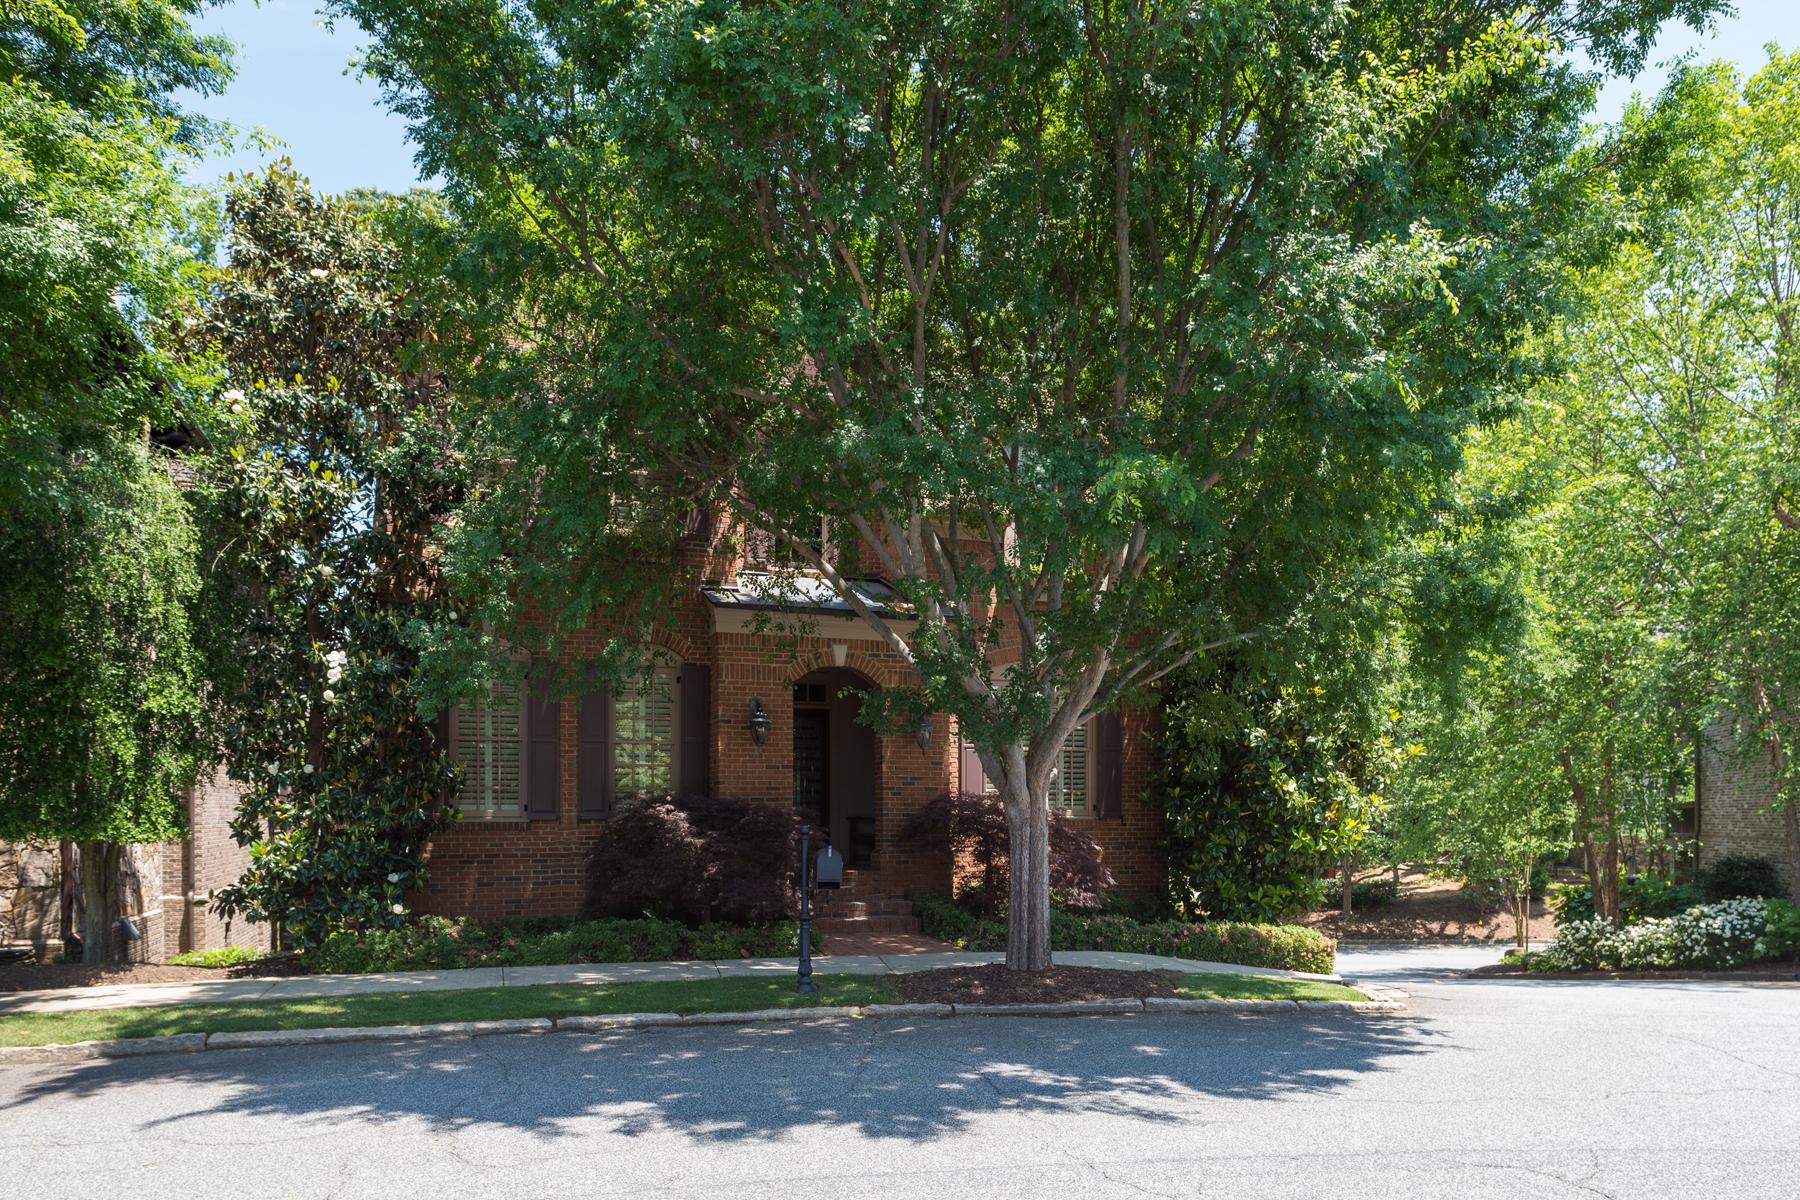 Single Family Home for Sale at Great Value On The Park 11 Conifer Circle NE Atlanta, Georgia, 30342 United States